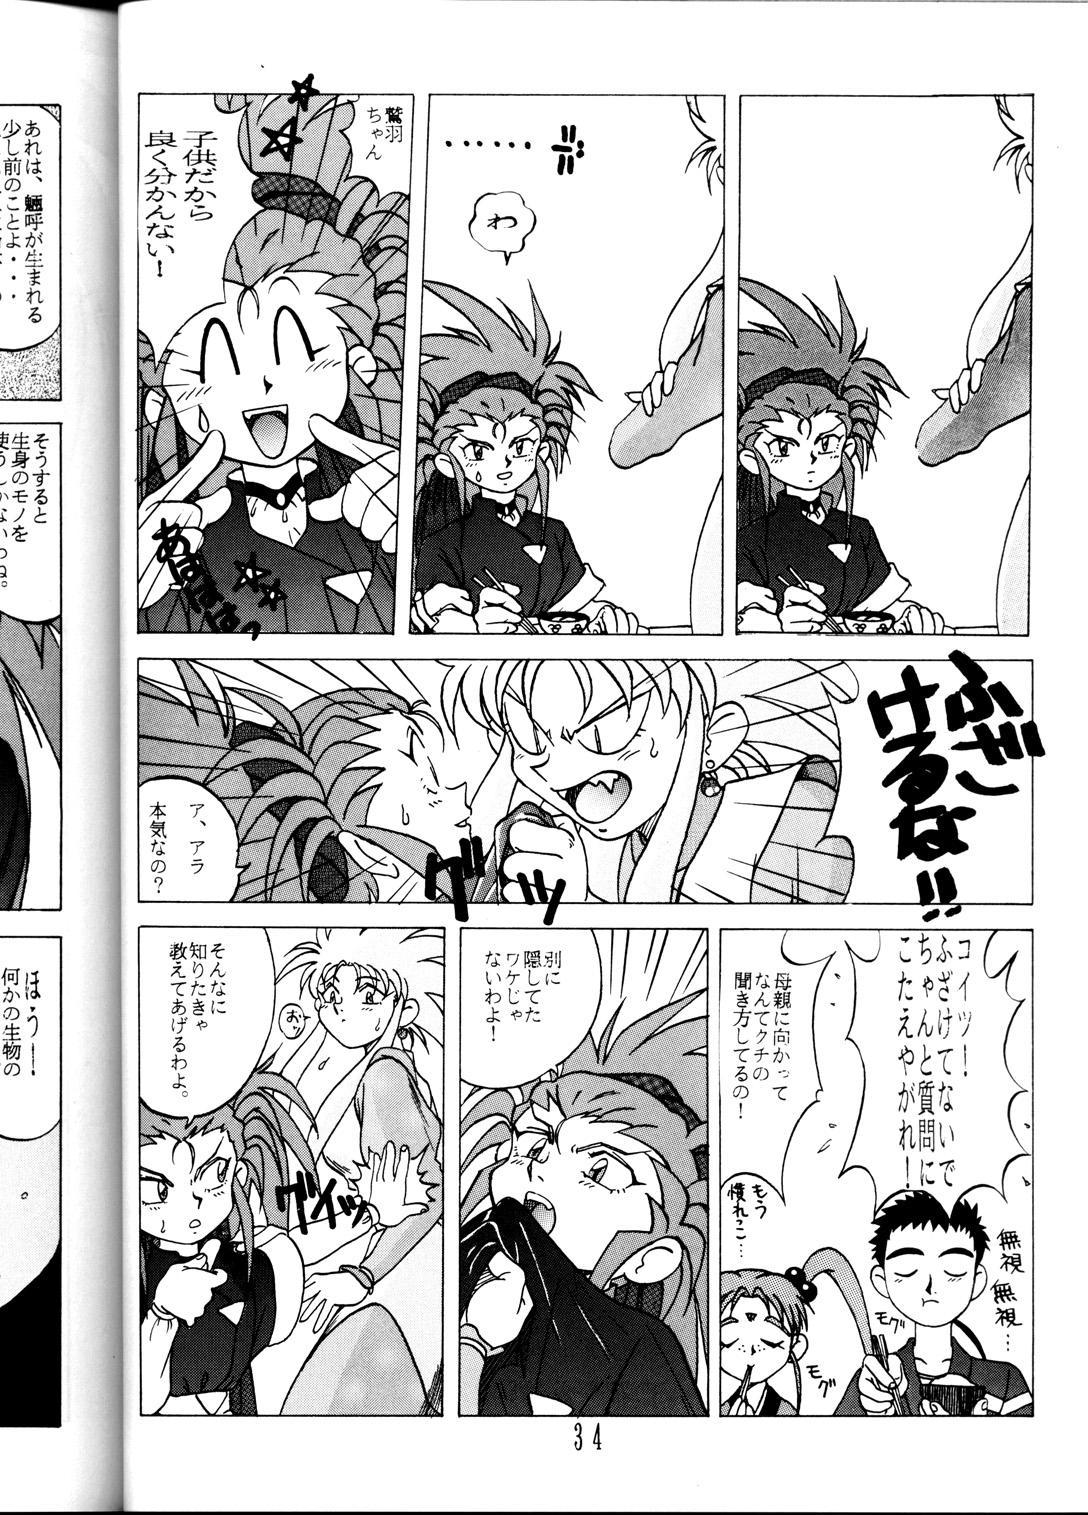 Tenchi Muyou! Sample Vol 6 32